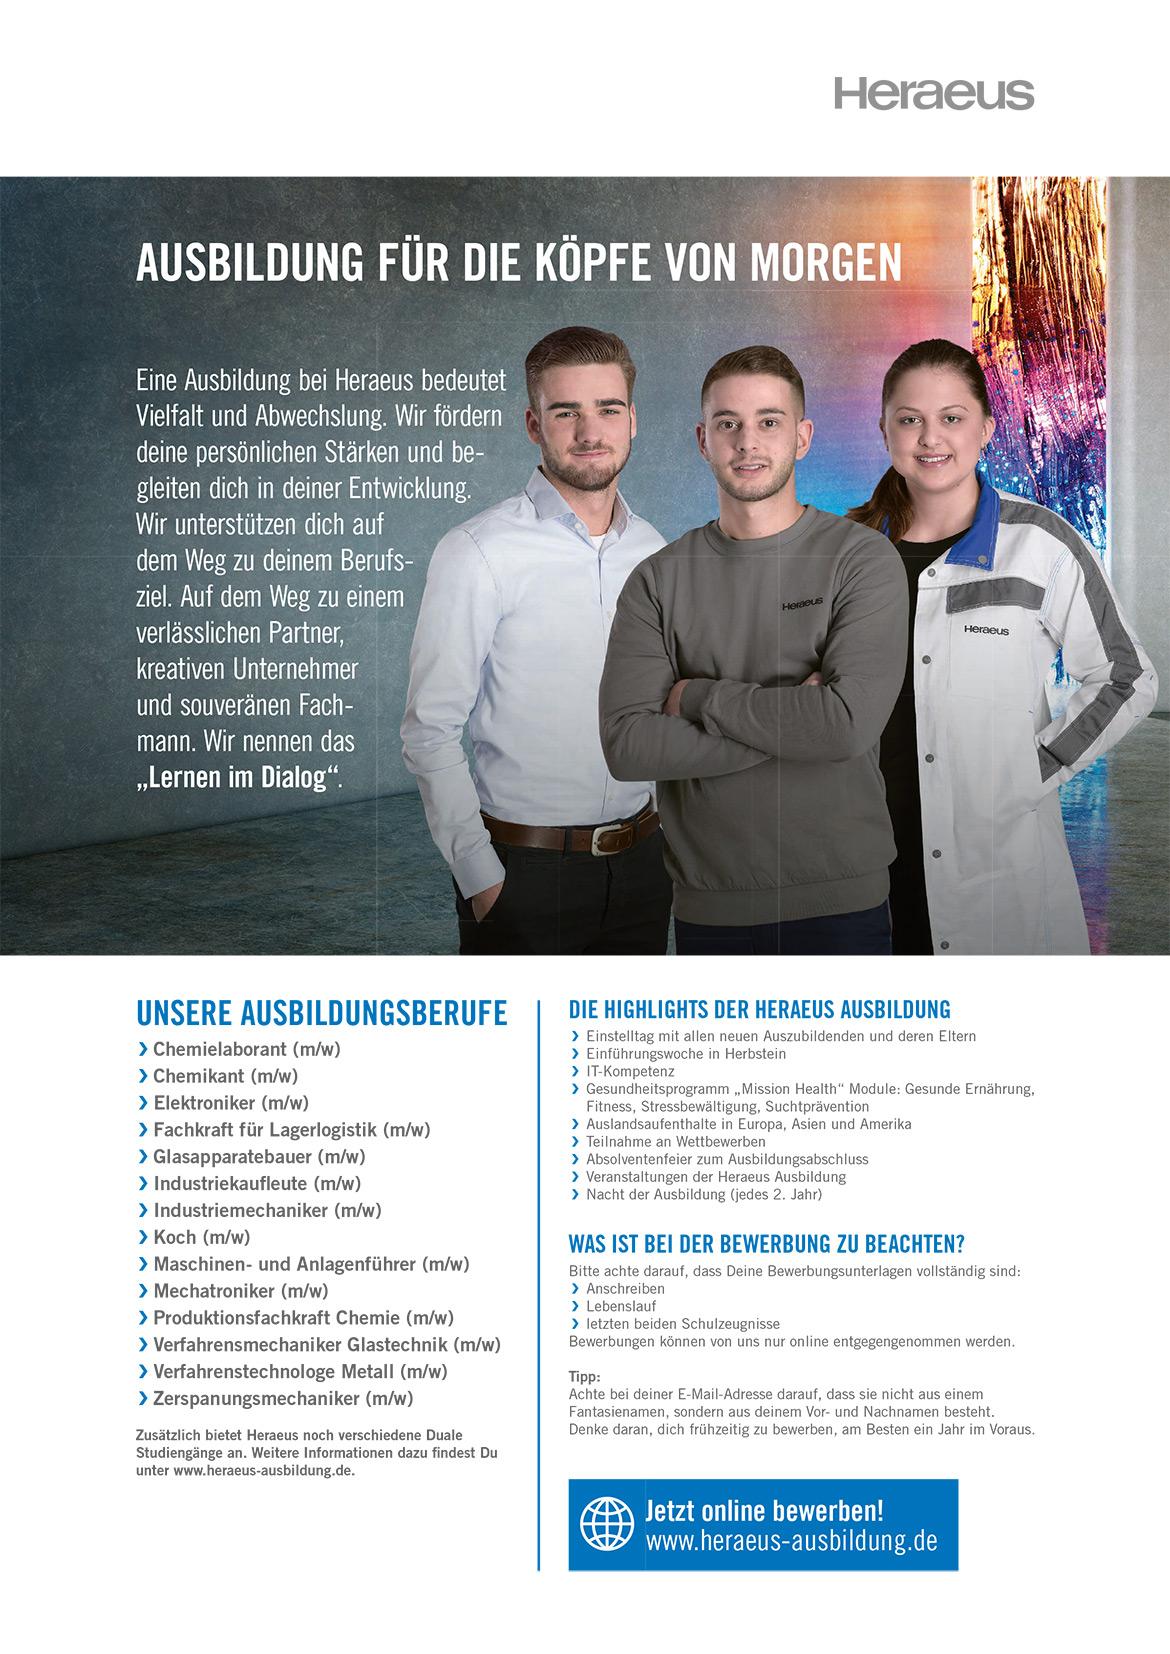 Ausbildungsplakat: Heraeus Holding GmbH